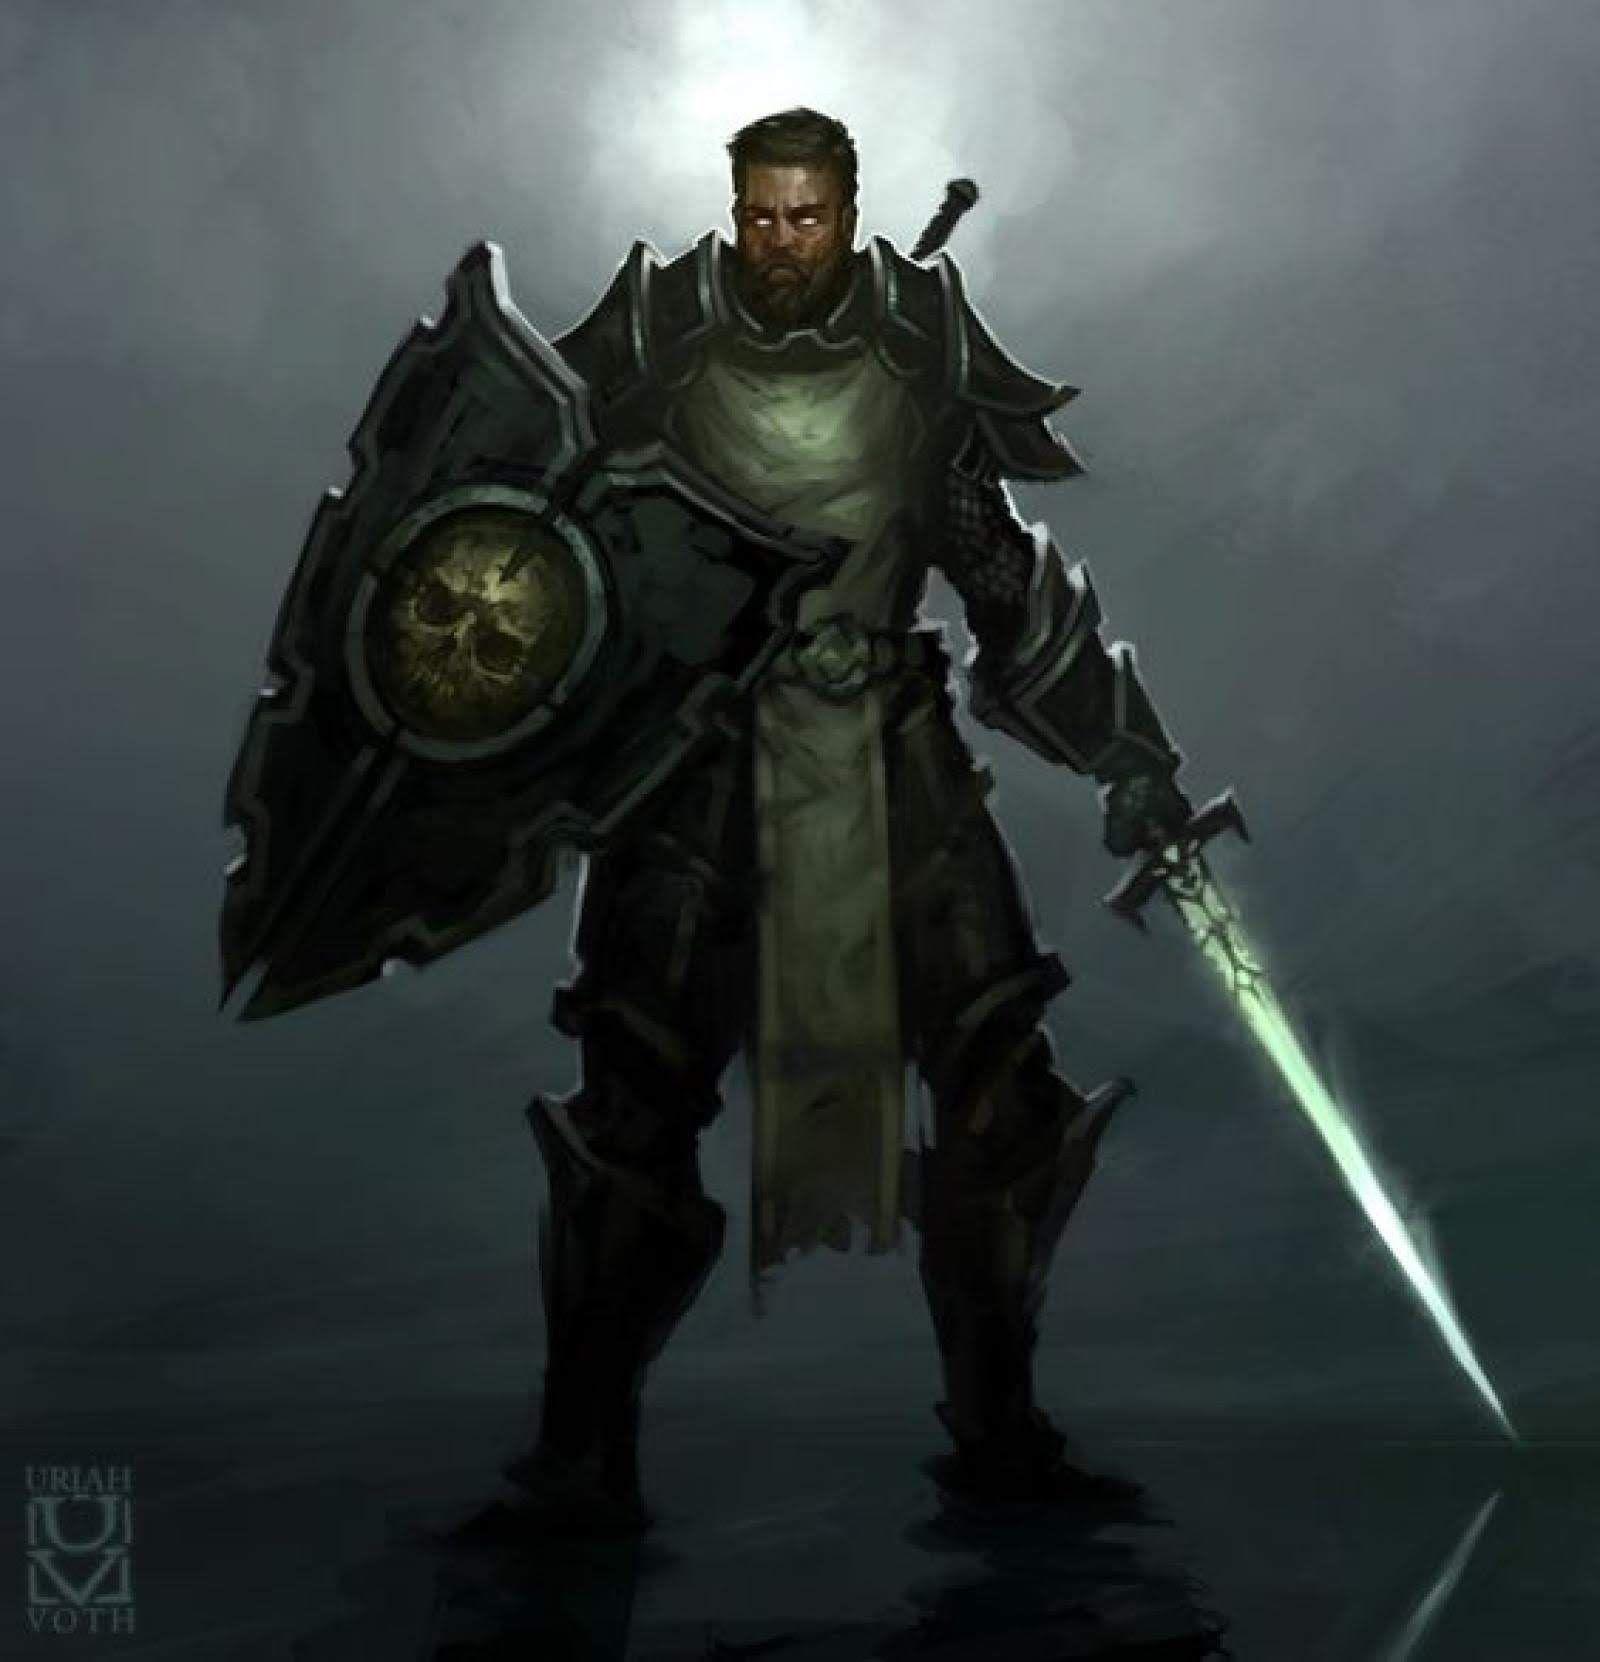 Pin by King Neon on Fantasy Character Art | Dark paladin, Dungeons and dragons characters, Paladin